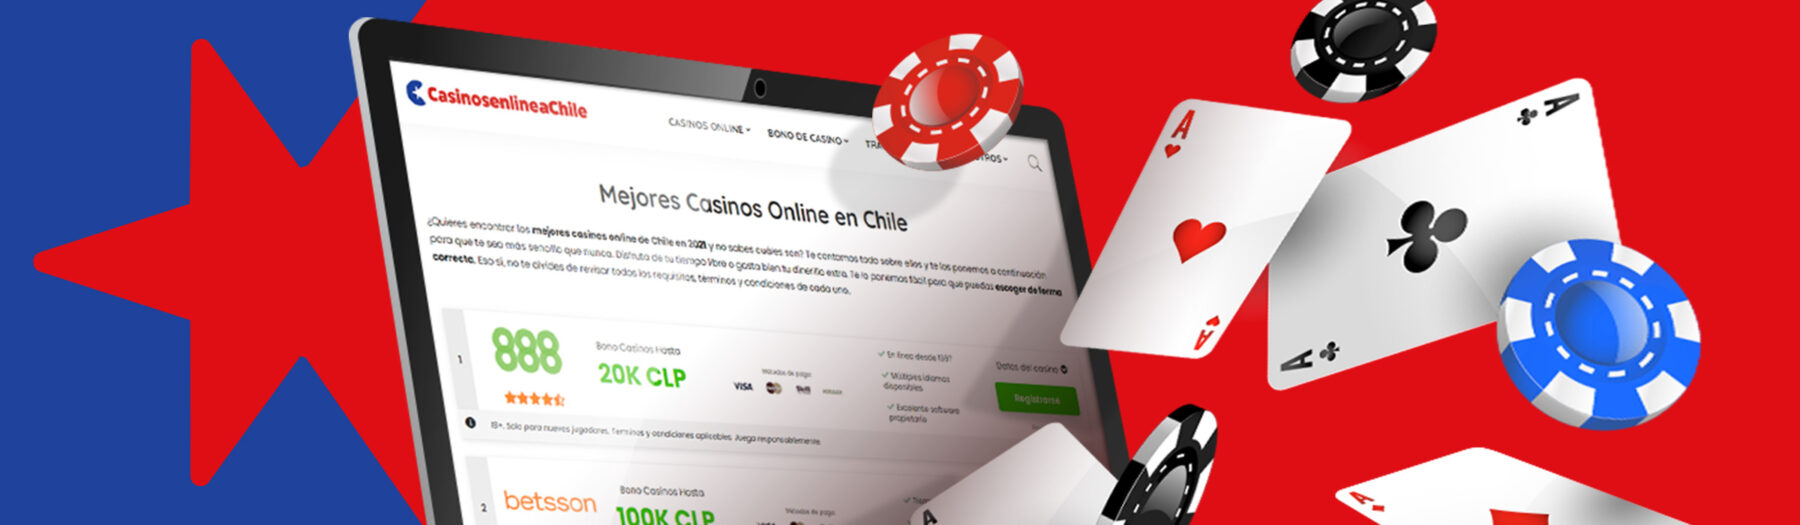 Mejores Casinos Online Chilenos